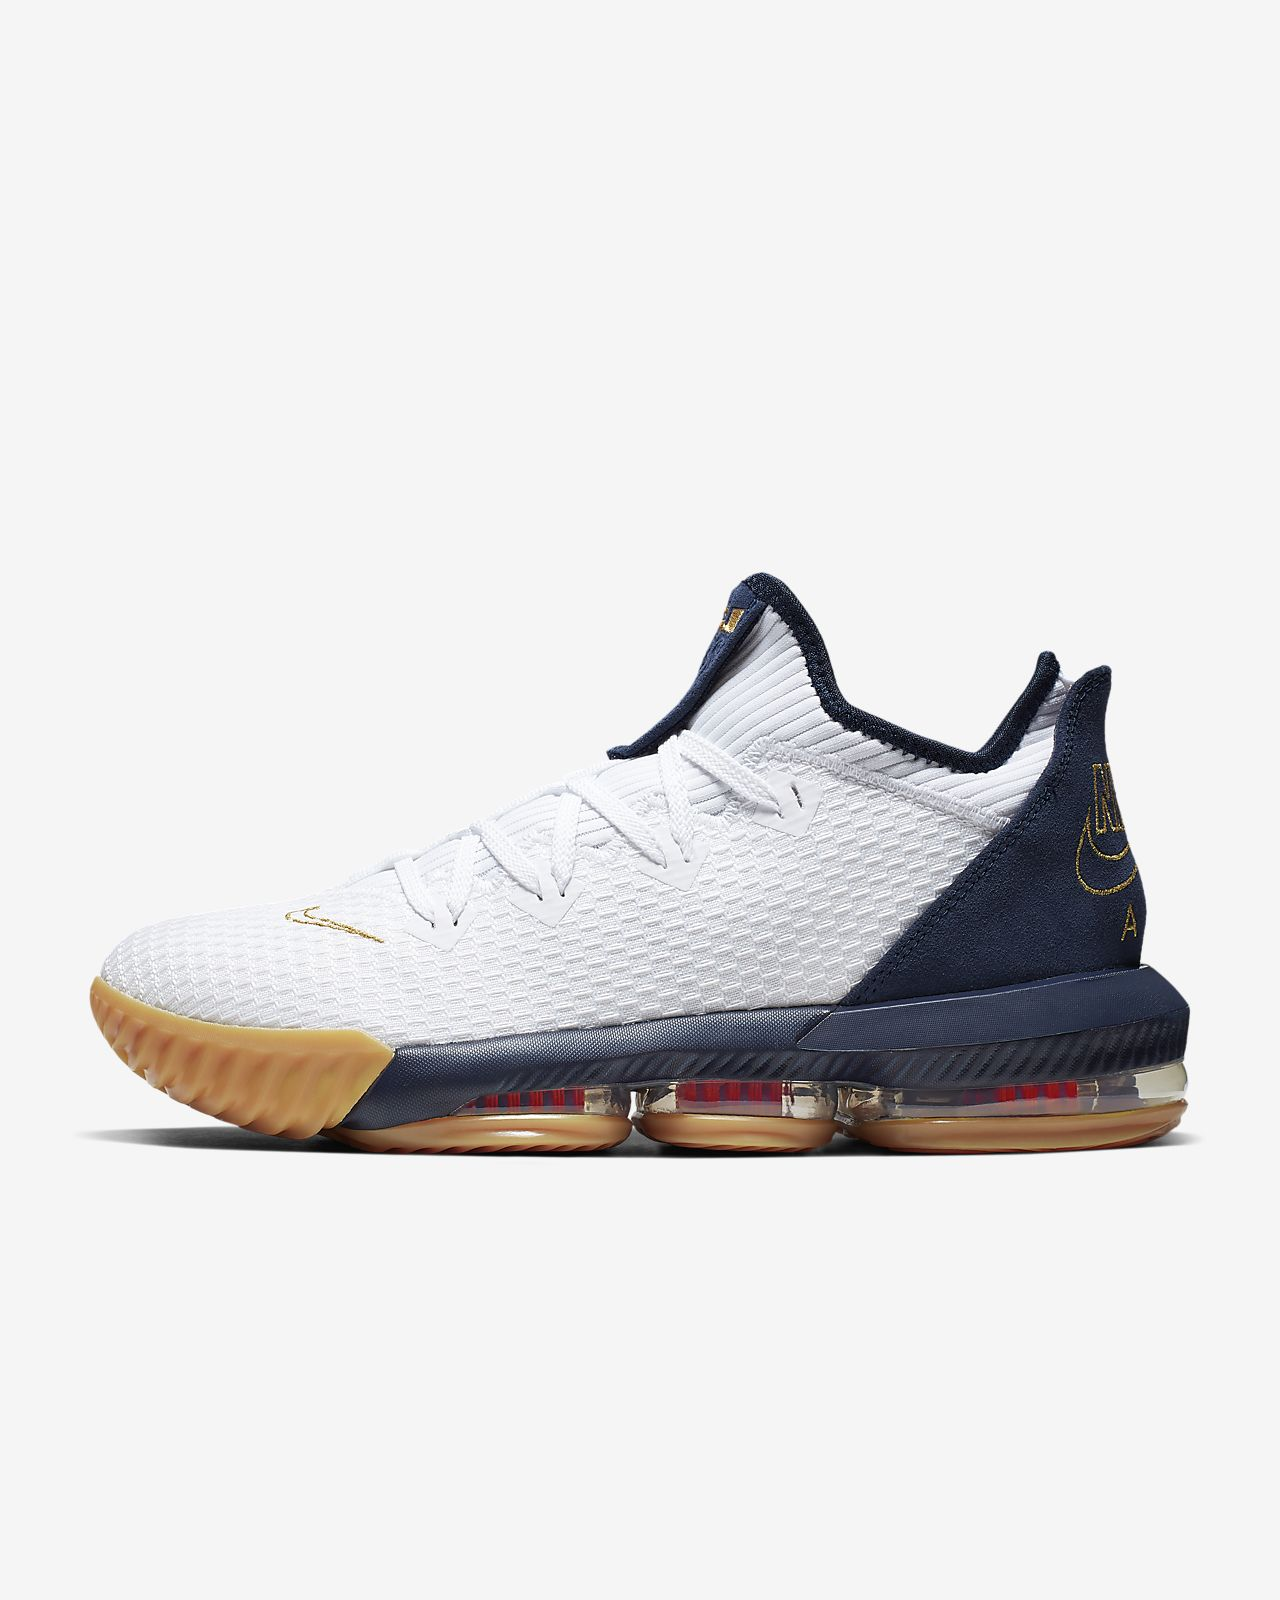 LeBron 16 Low 籃球鞋